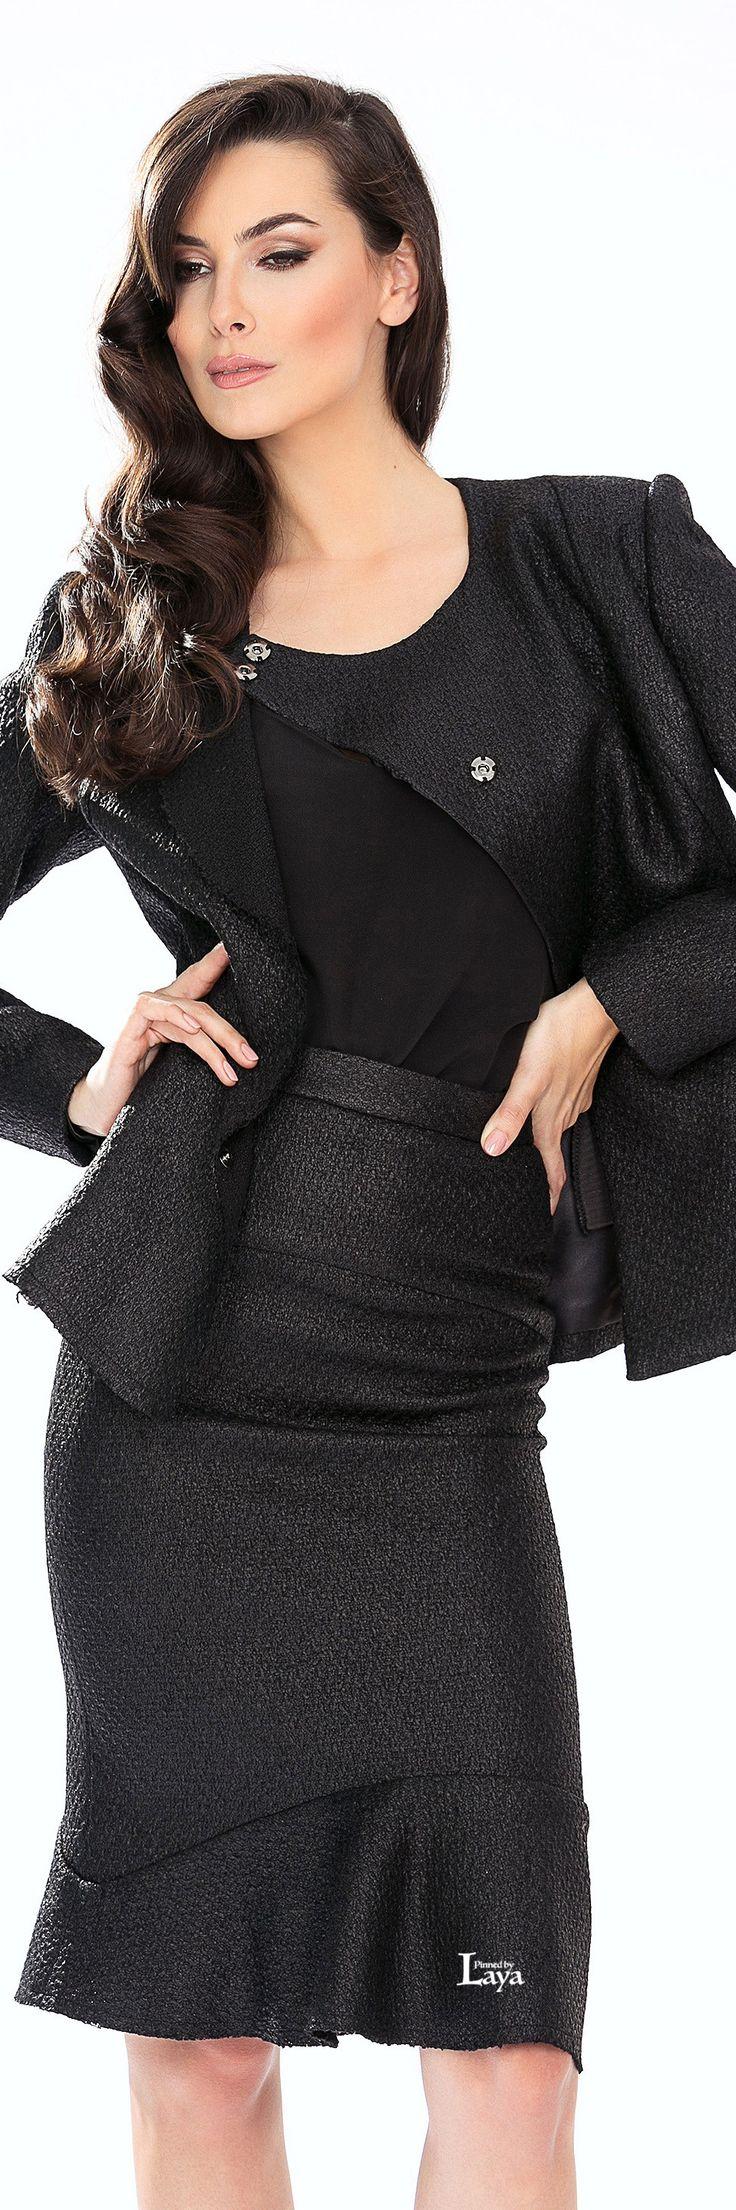 Cristallini suit via @amarandos. #suits #Cristallini